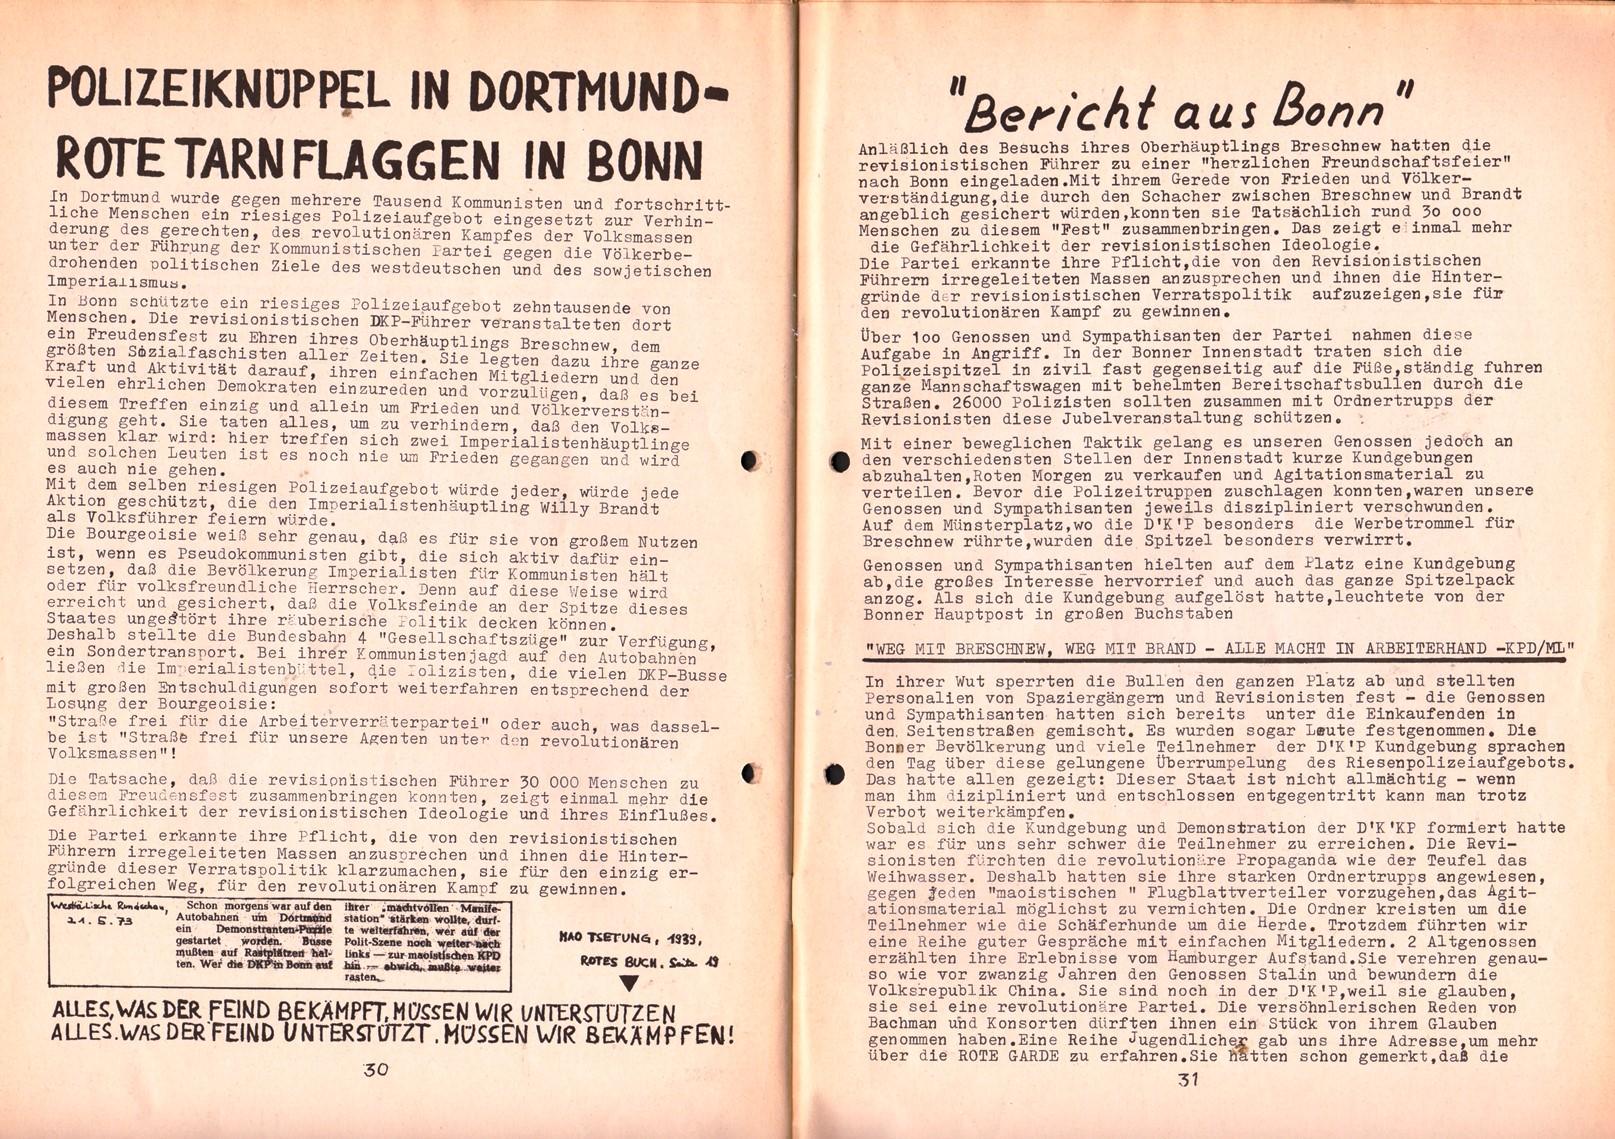 KPDML_1973_Breschnew_Besuch_in_Bonn_16